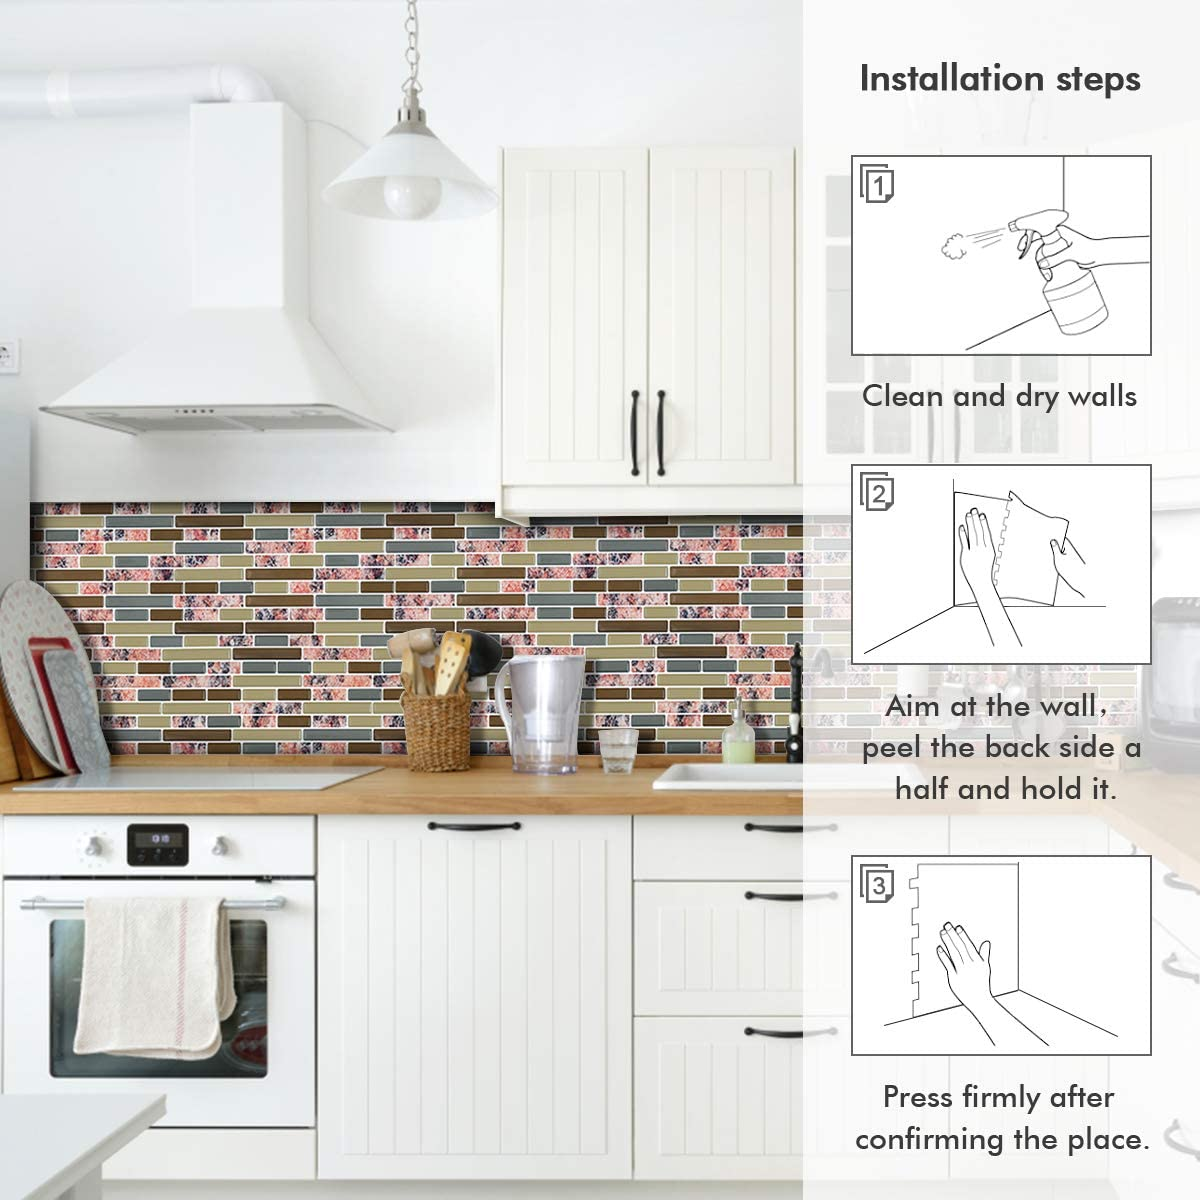 Peel and Stick Backsplash Granite Texture Design Self Adhesive Removable Backsplash Tiles Backsplash Tile for Kitchen Peel and Stick Red-Brown, 11x 9.25, 4 Sheets